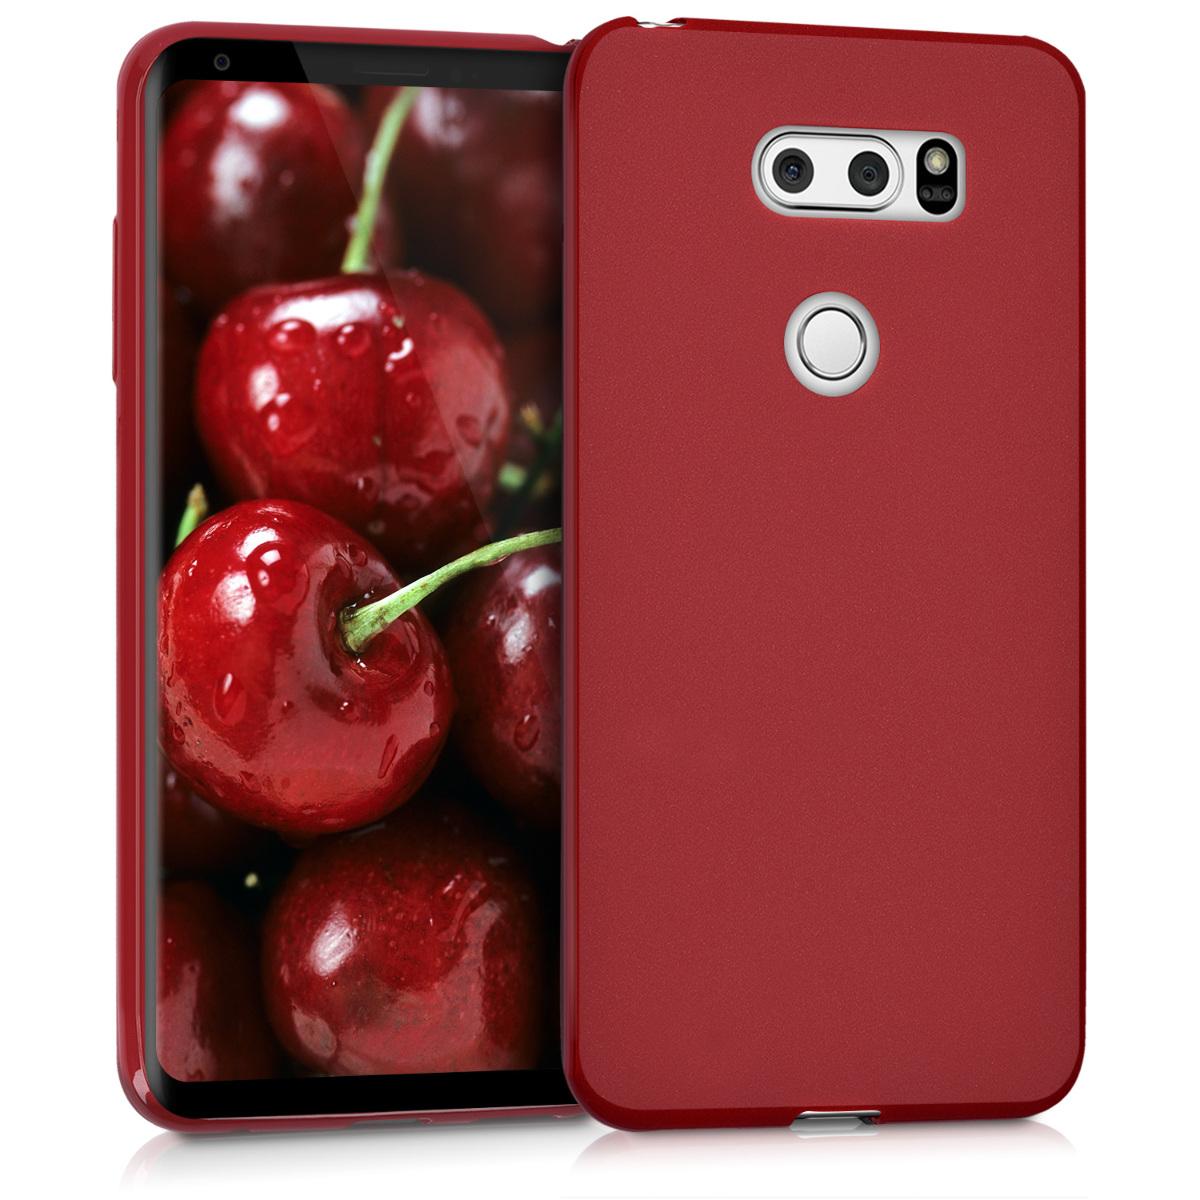 KW Θήκη Σιλικόνης LG V30 - Red Matte (42749.51)